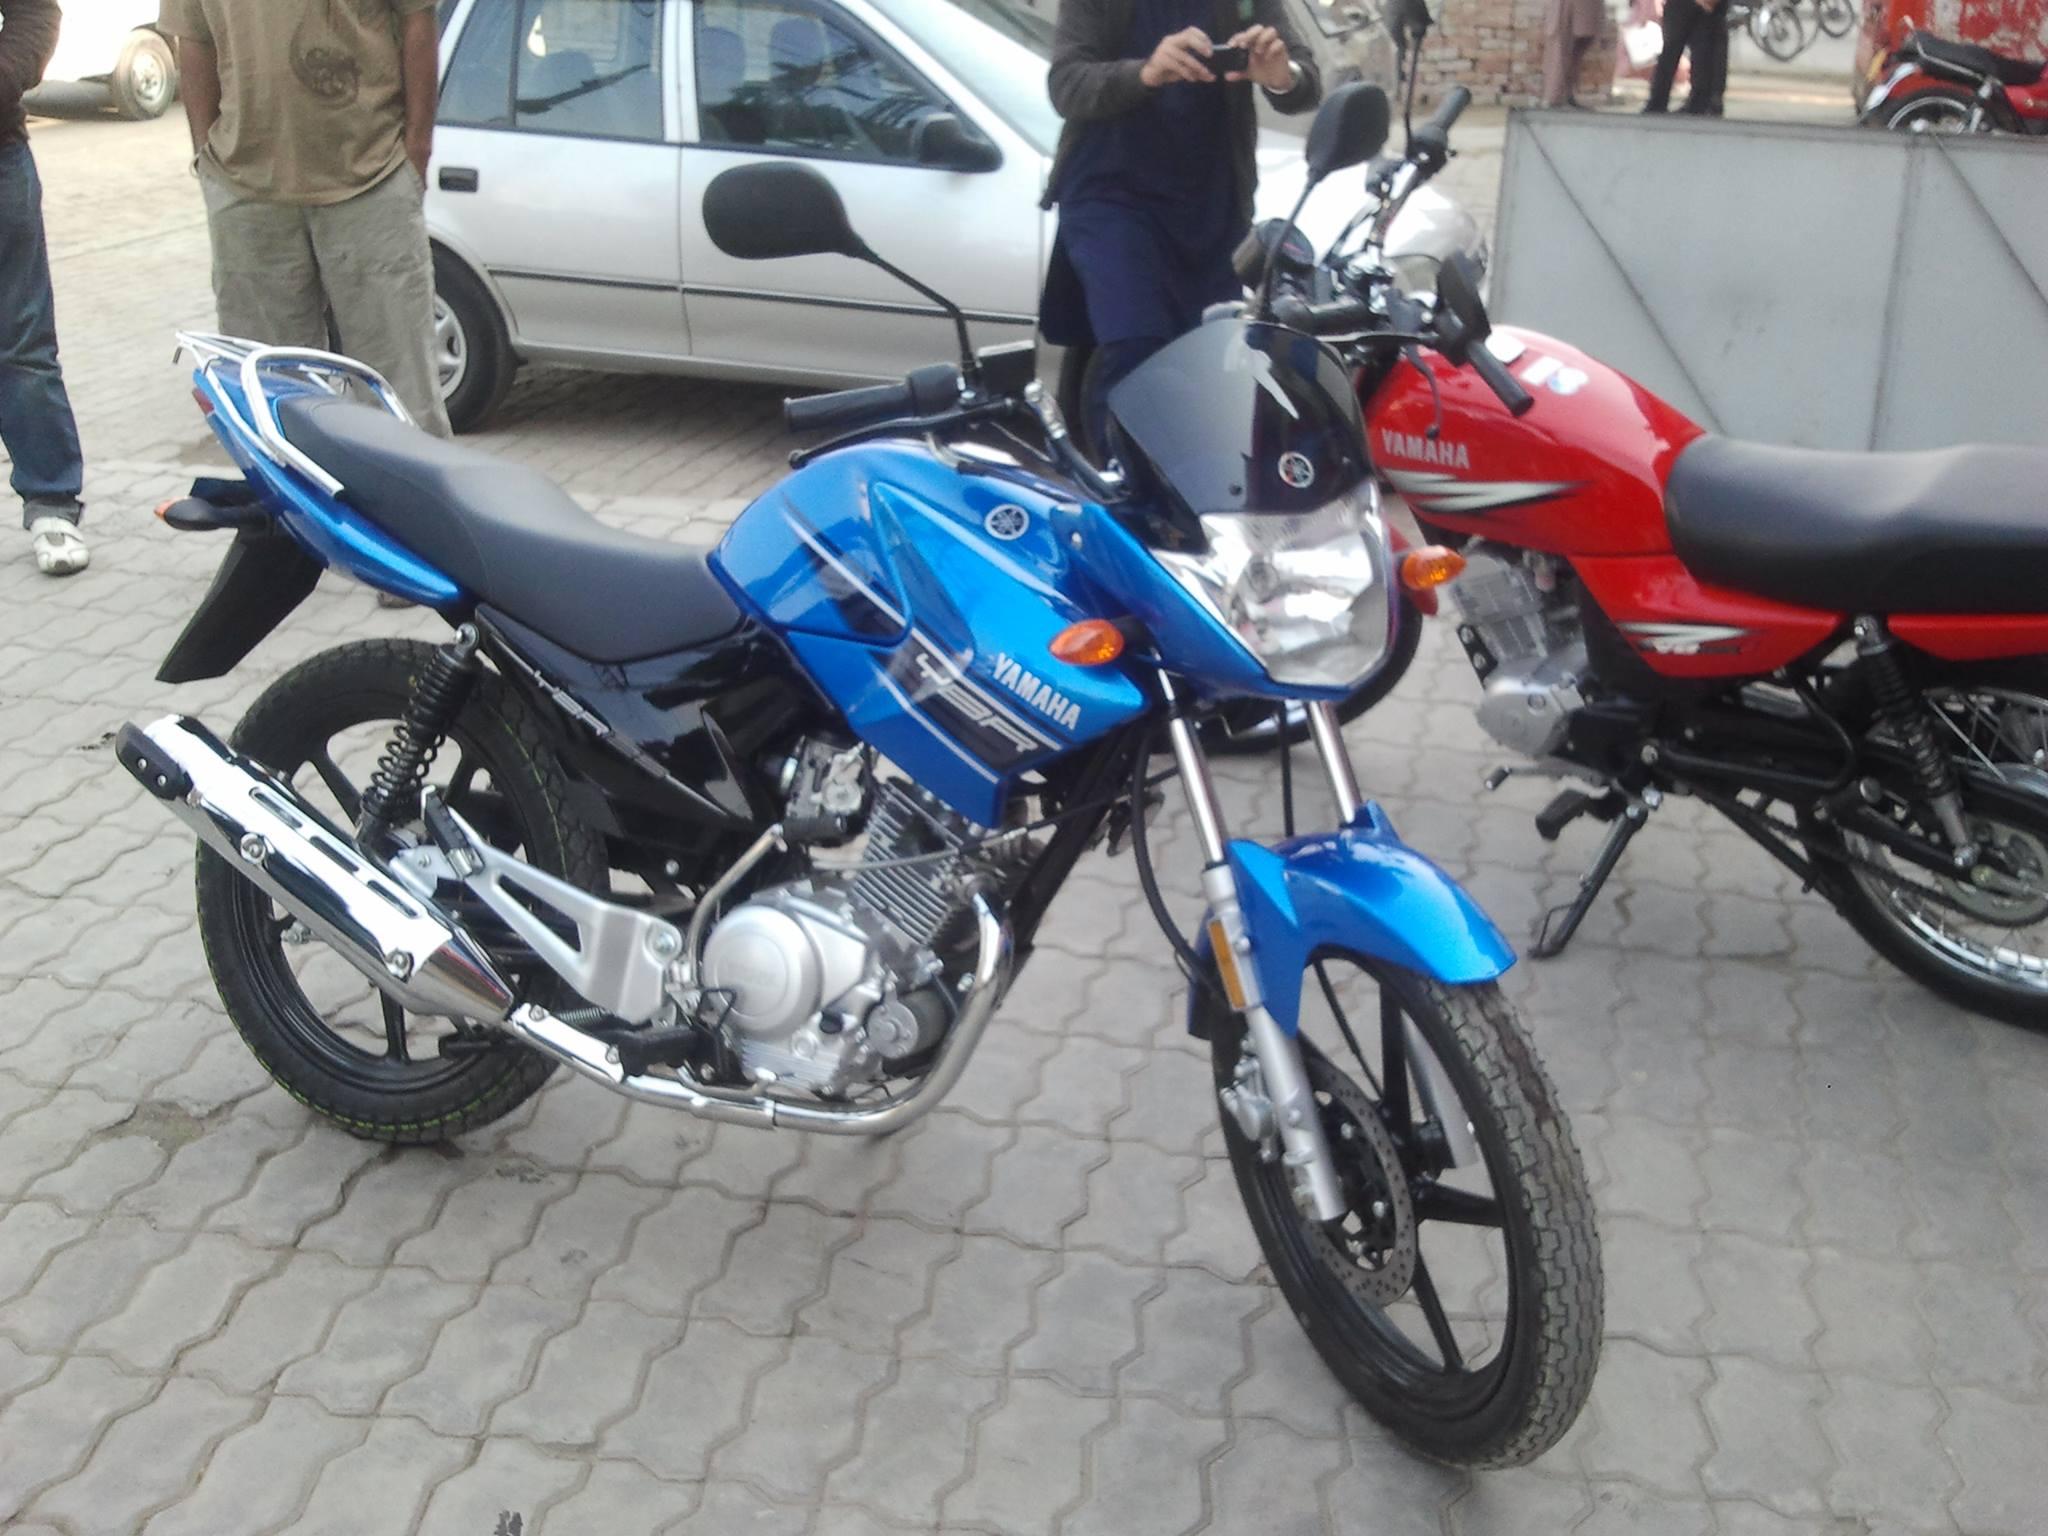 Yamaha For Sale In Pakistan